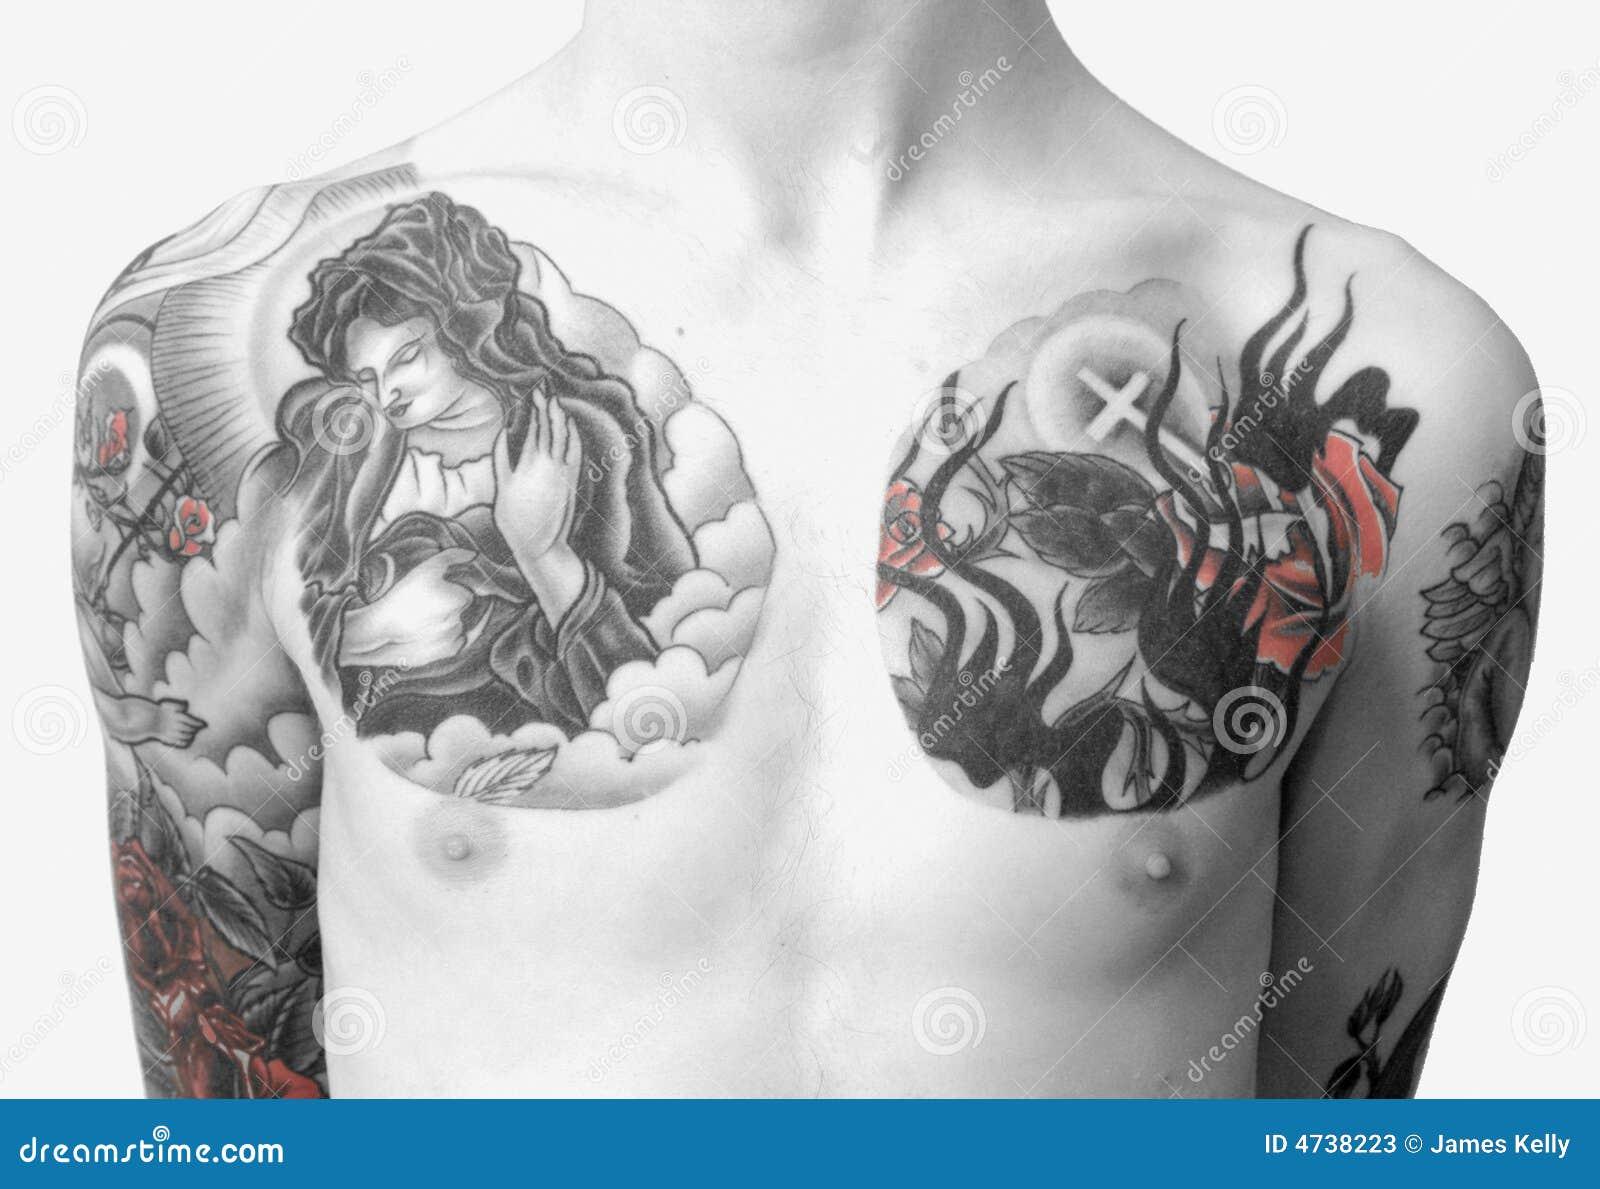 Tattoo Chest Stock Photos - Image 4738223-6662